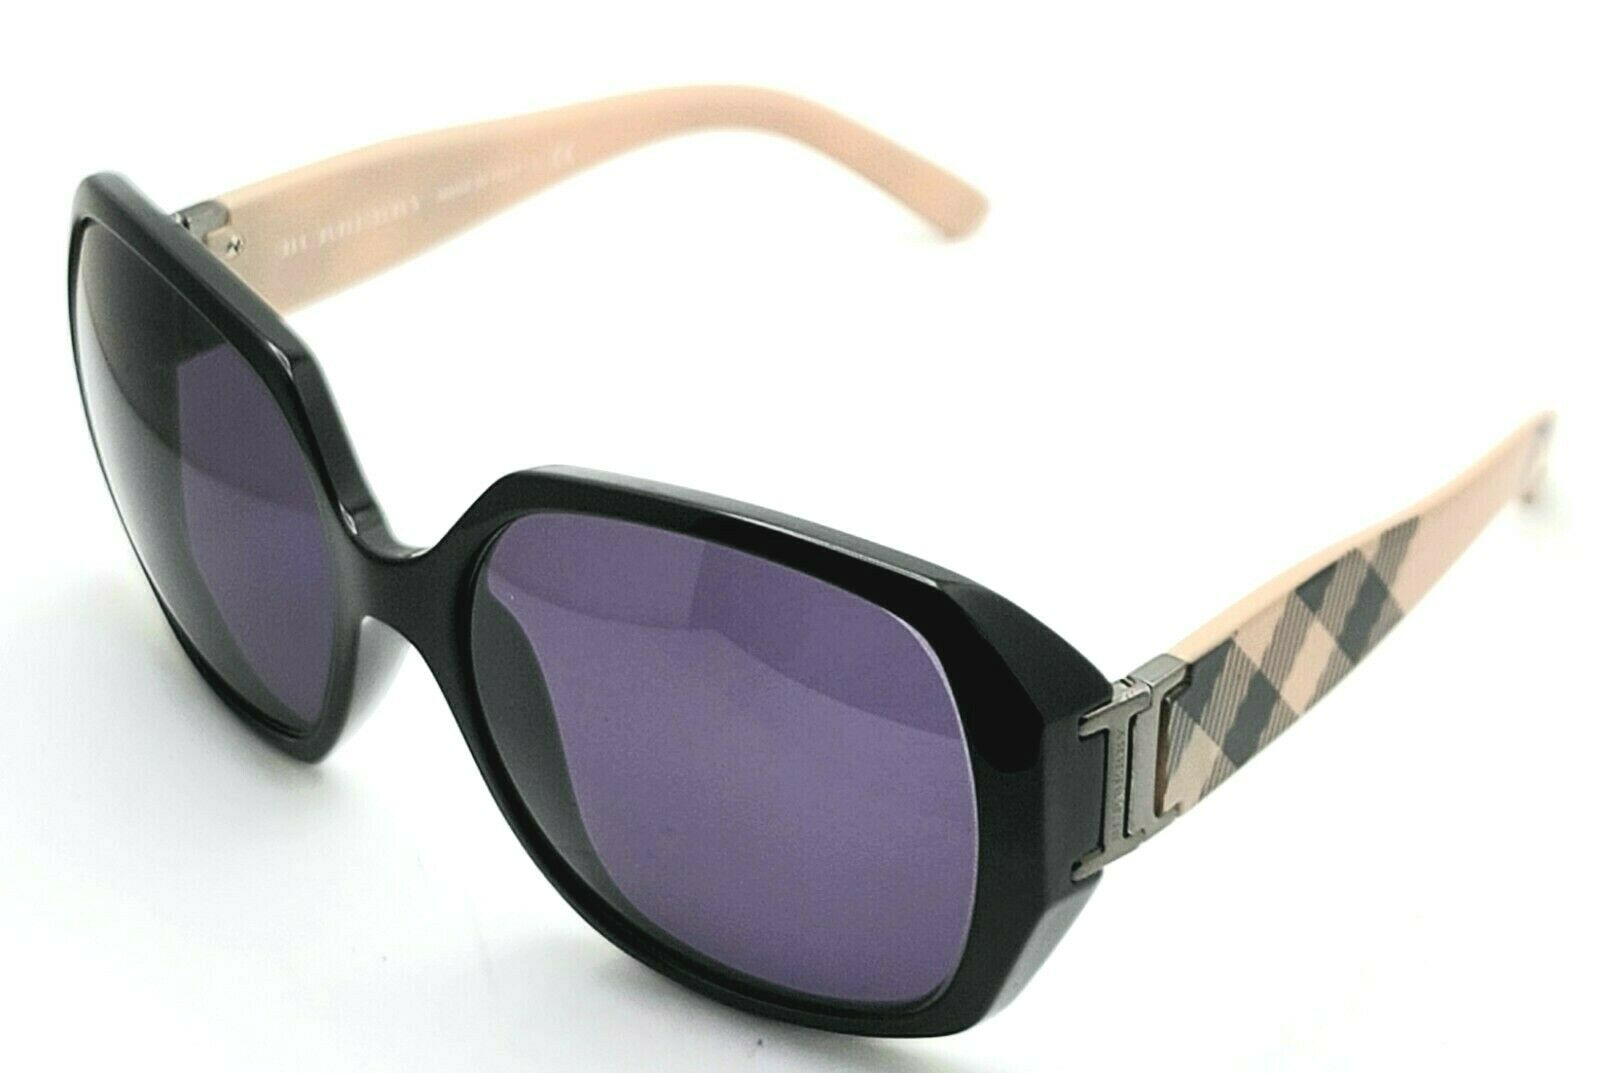 Burberry B4086 3001/73 Round black Women's Sunglasses 51-17 135 Italy